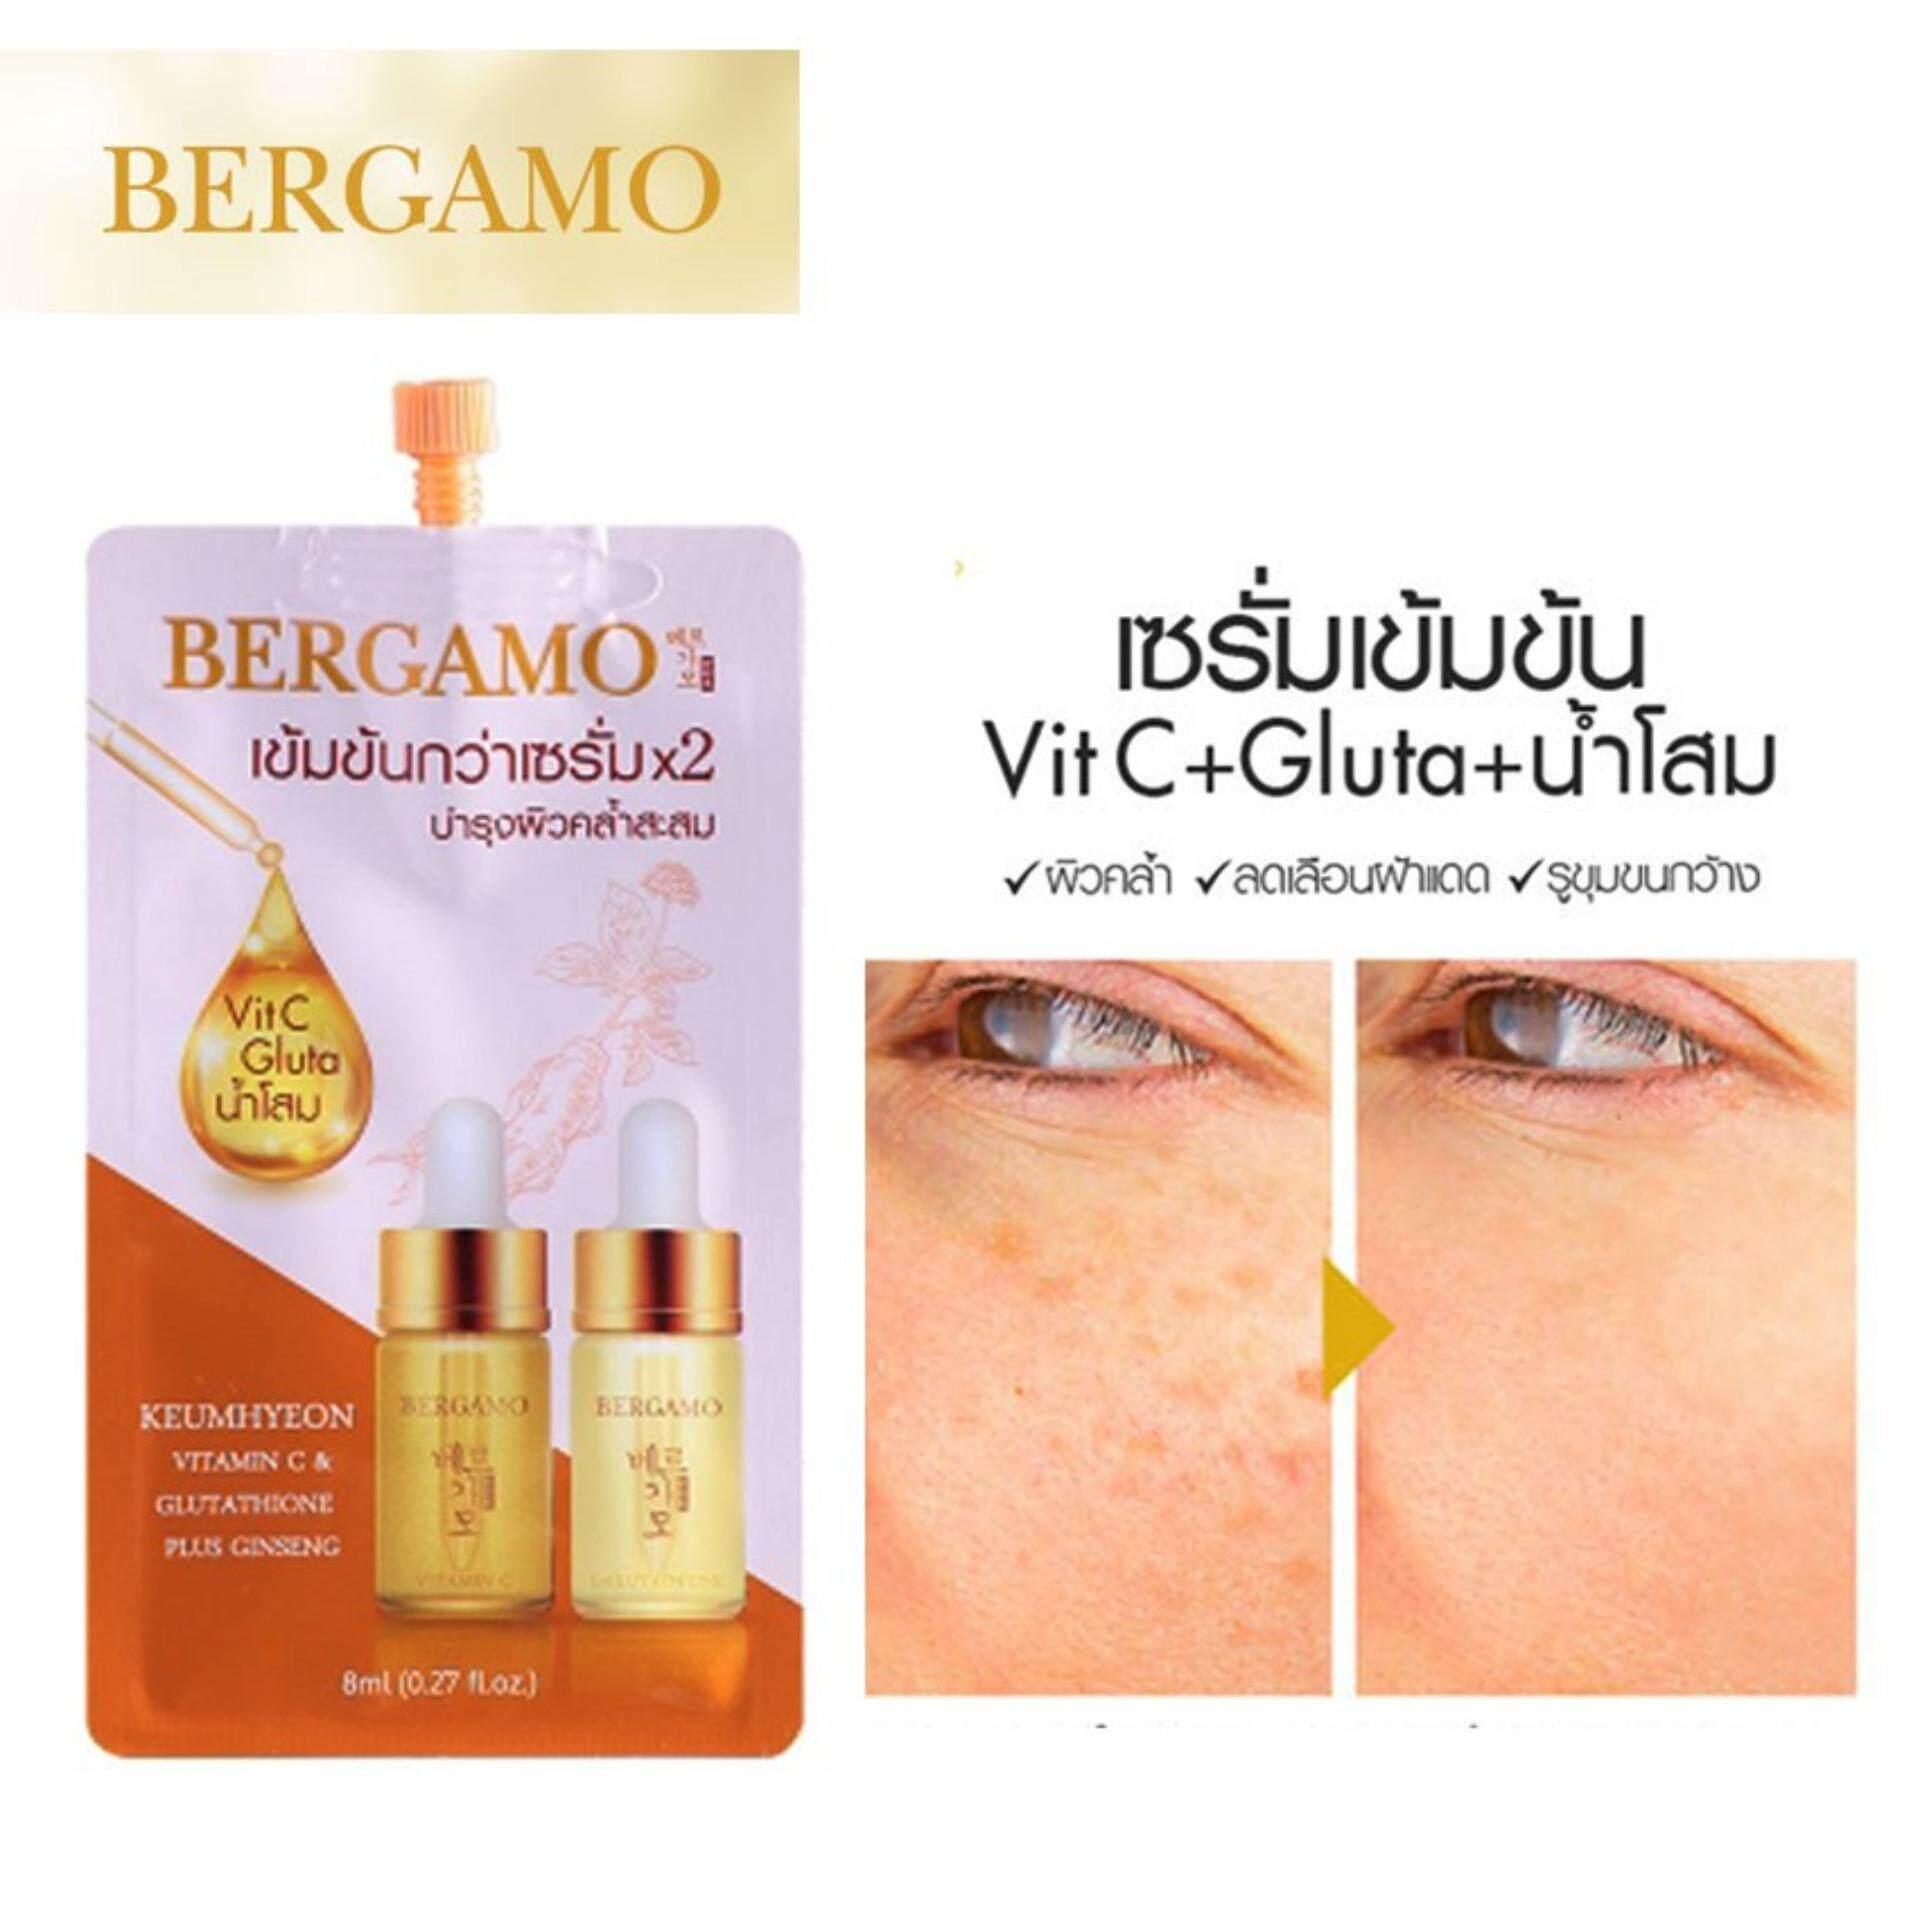 Karmart  Bergamo Keumhyeon Vitamin C And Glutathione Plus Ginseng 8ml  วิตามินซีแอนด์ ลูต้าไธโอน เซรั่มเข้มข้น เซรั่มบำรุงผิว เซรั่มทาหน้า เซรั่มบำรุงผิวหน้า แบบซอง 8ml..